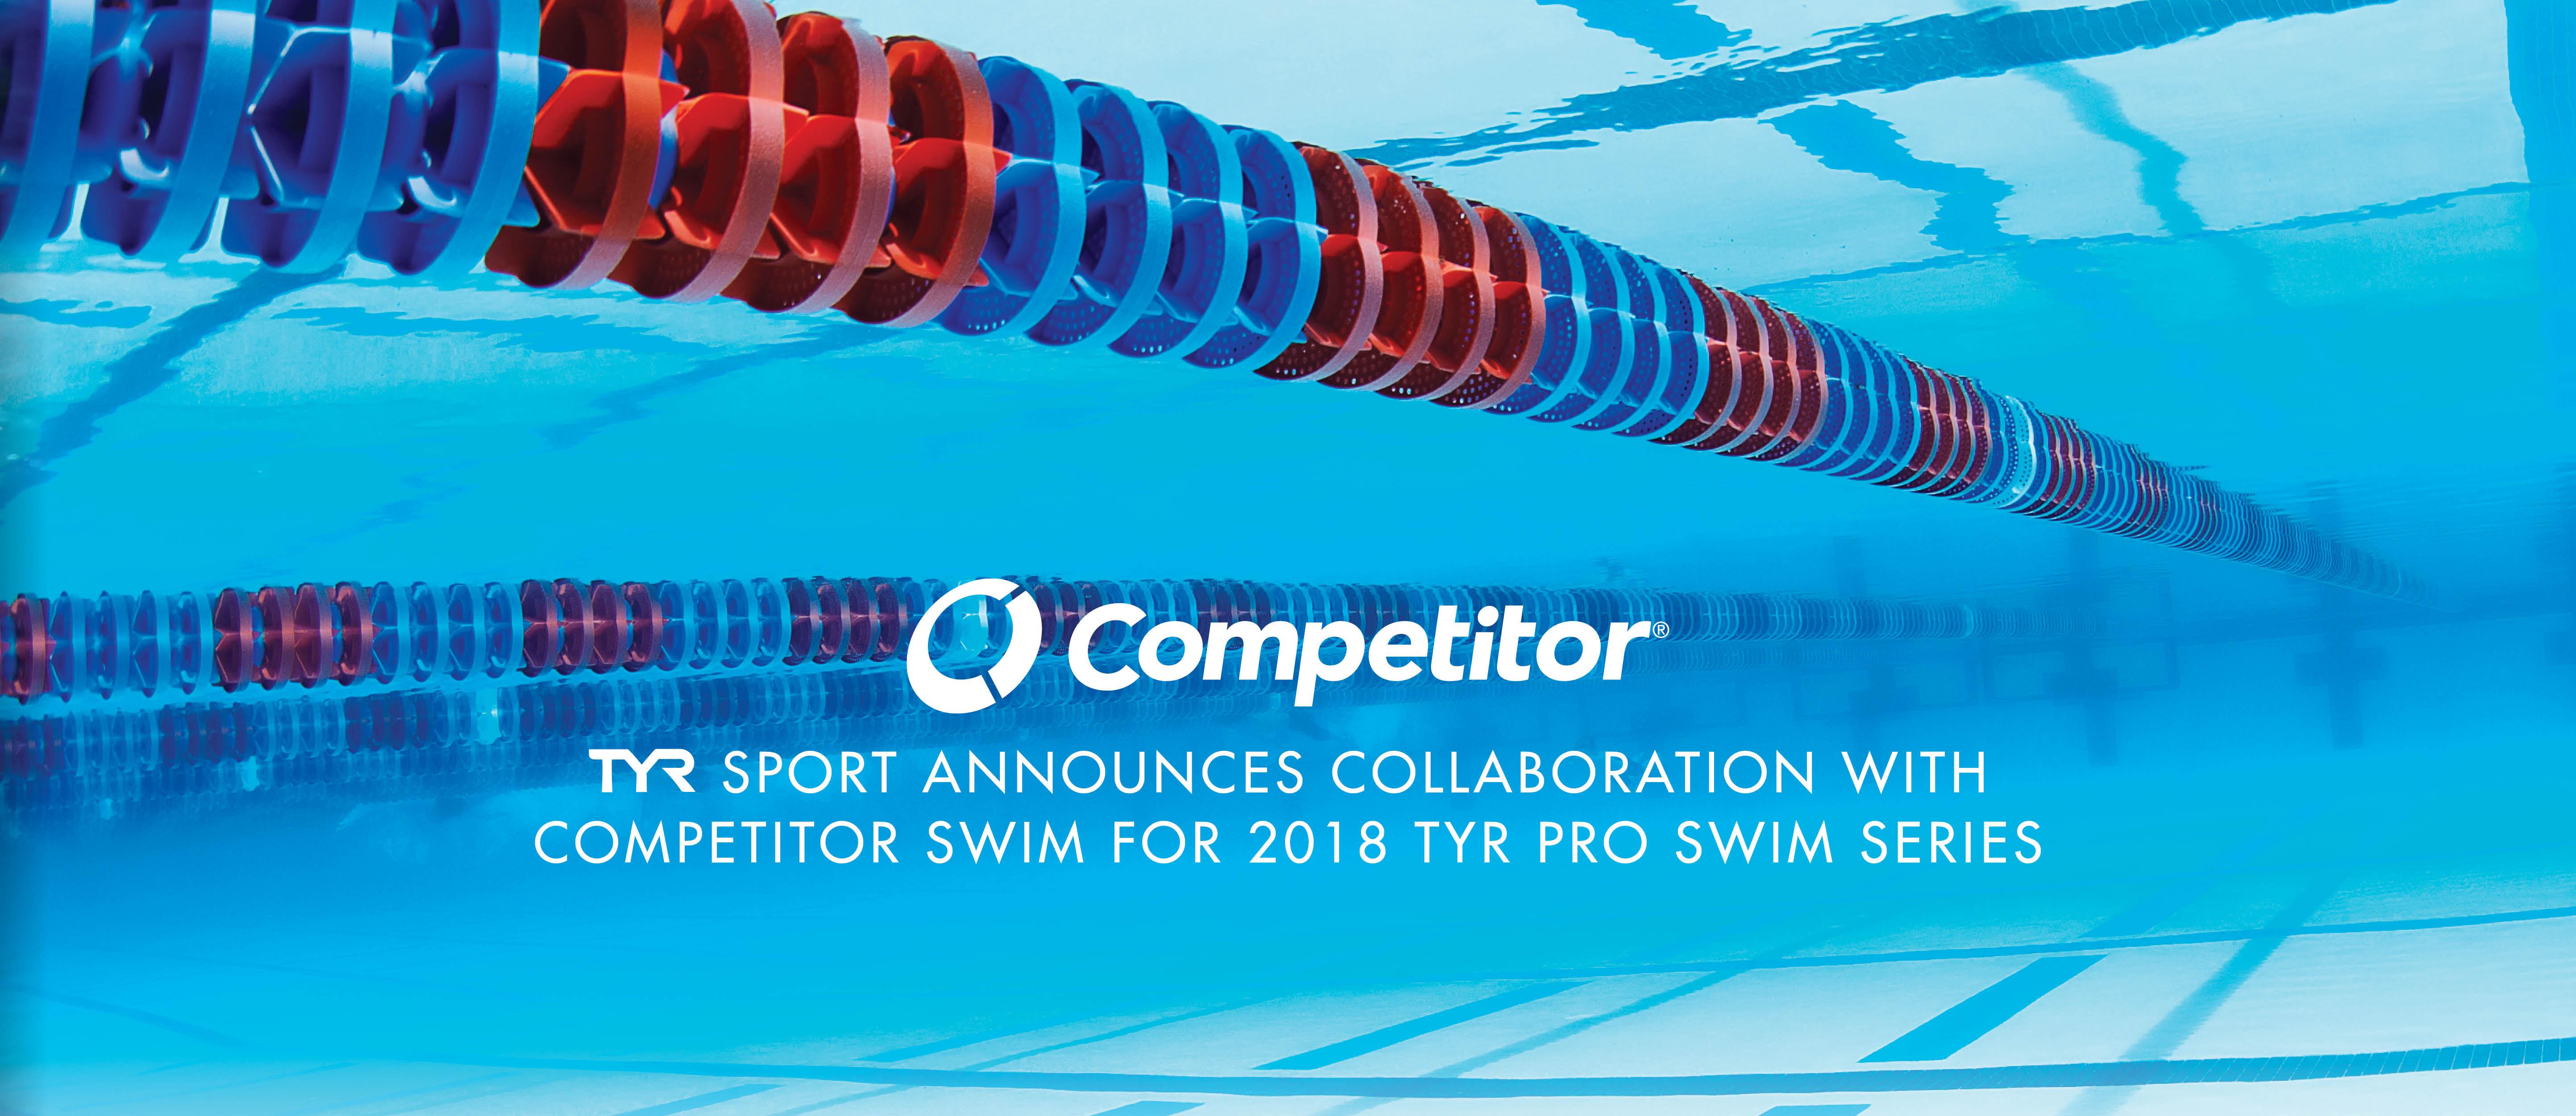 TYR Pro Swim Series